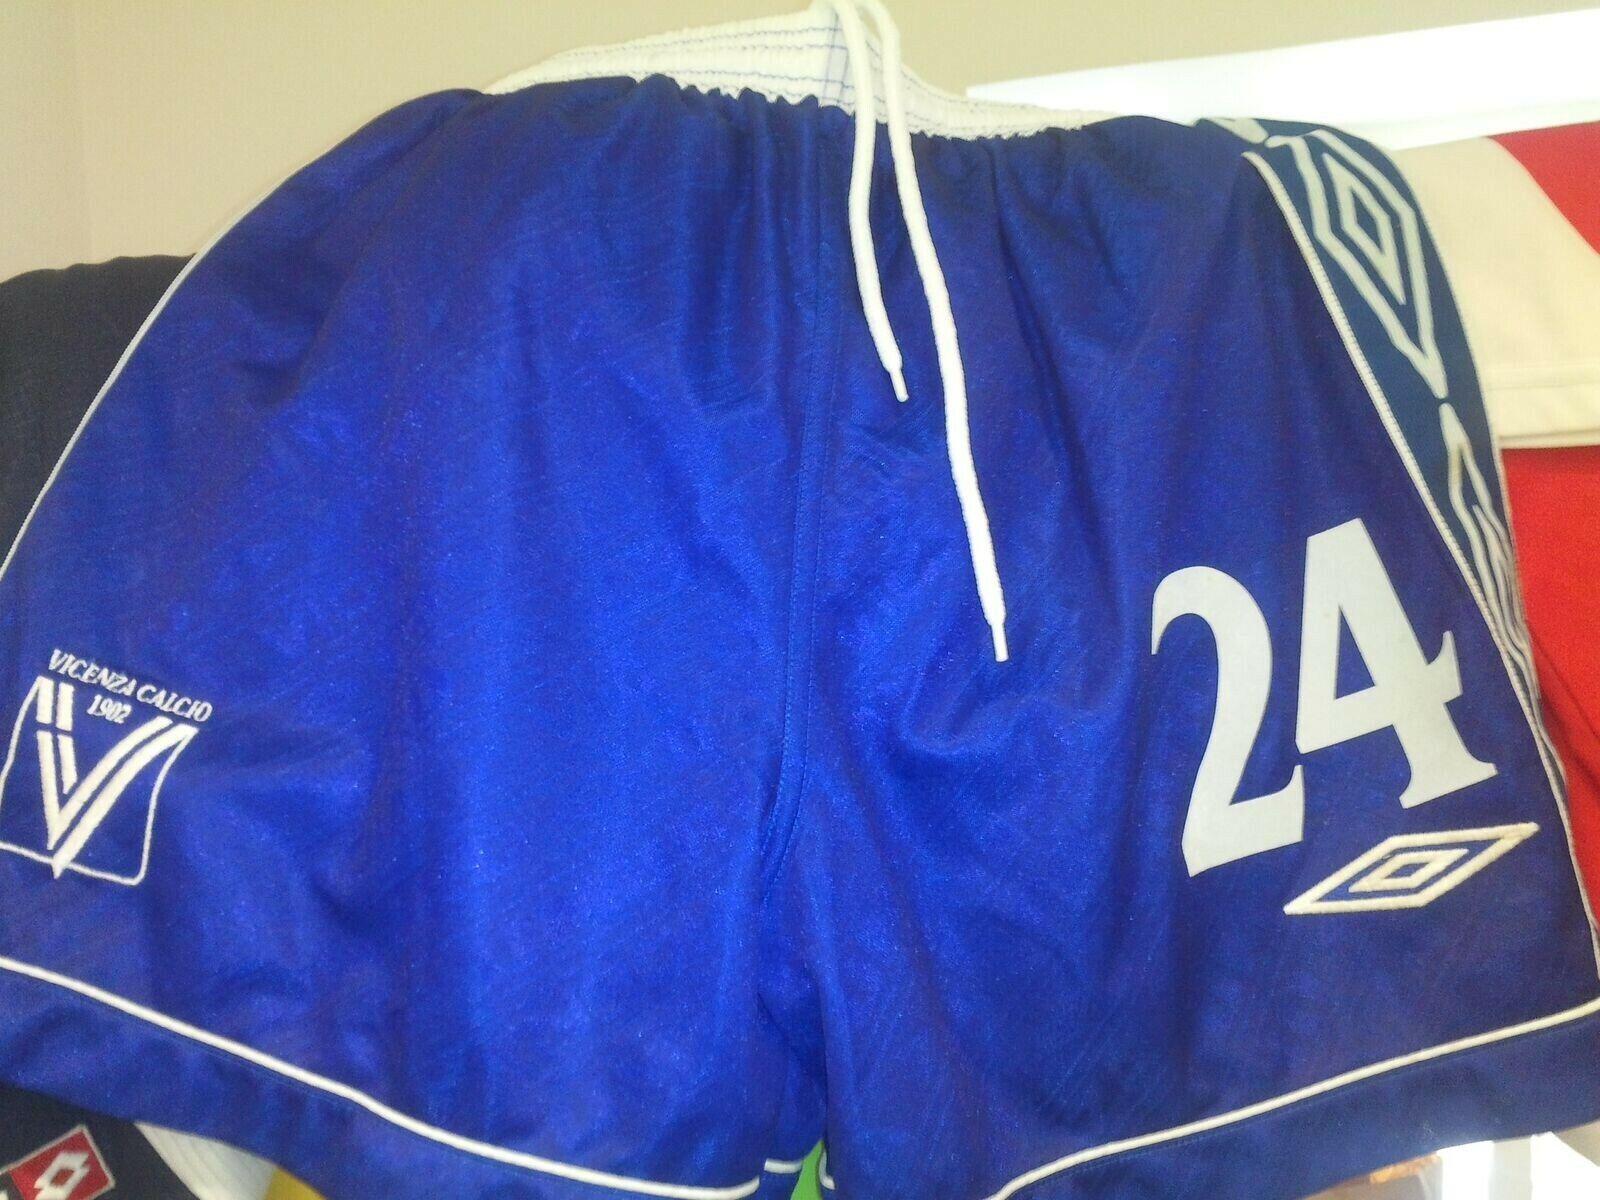 Pantaloncino vicenza match worn short no maglia shirt umbro serie a footbtutti